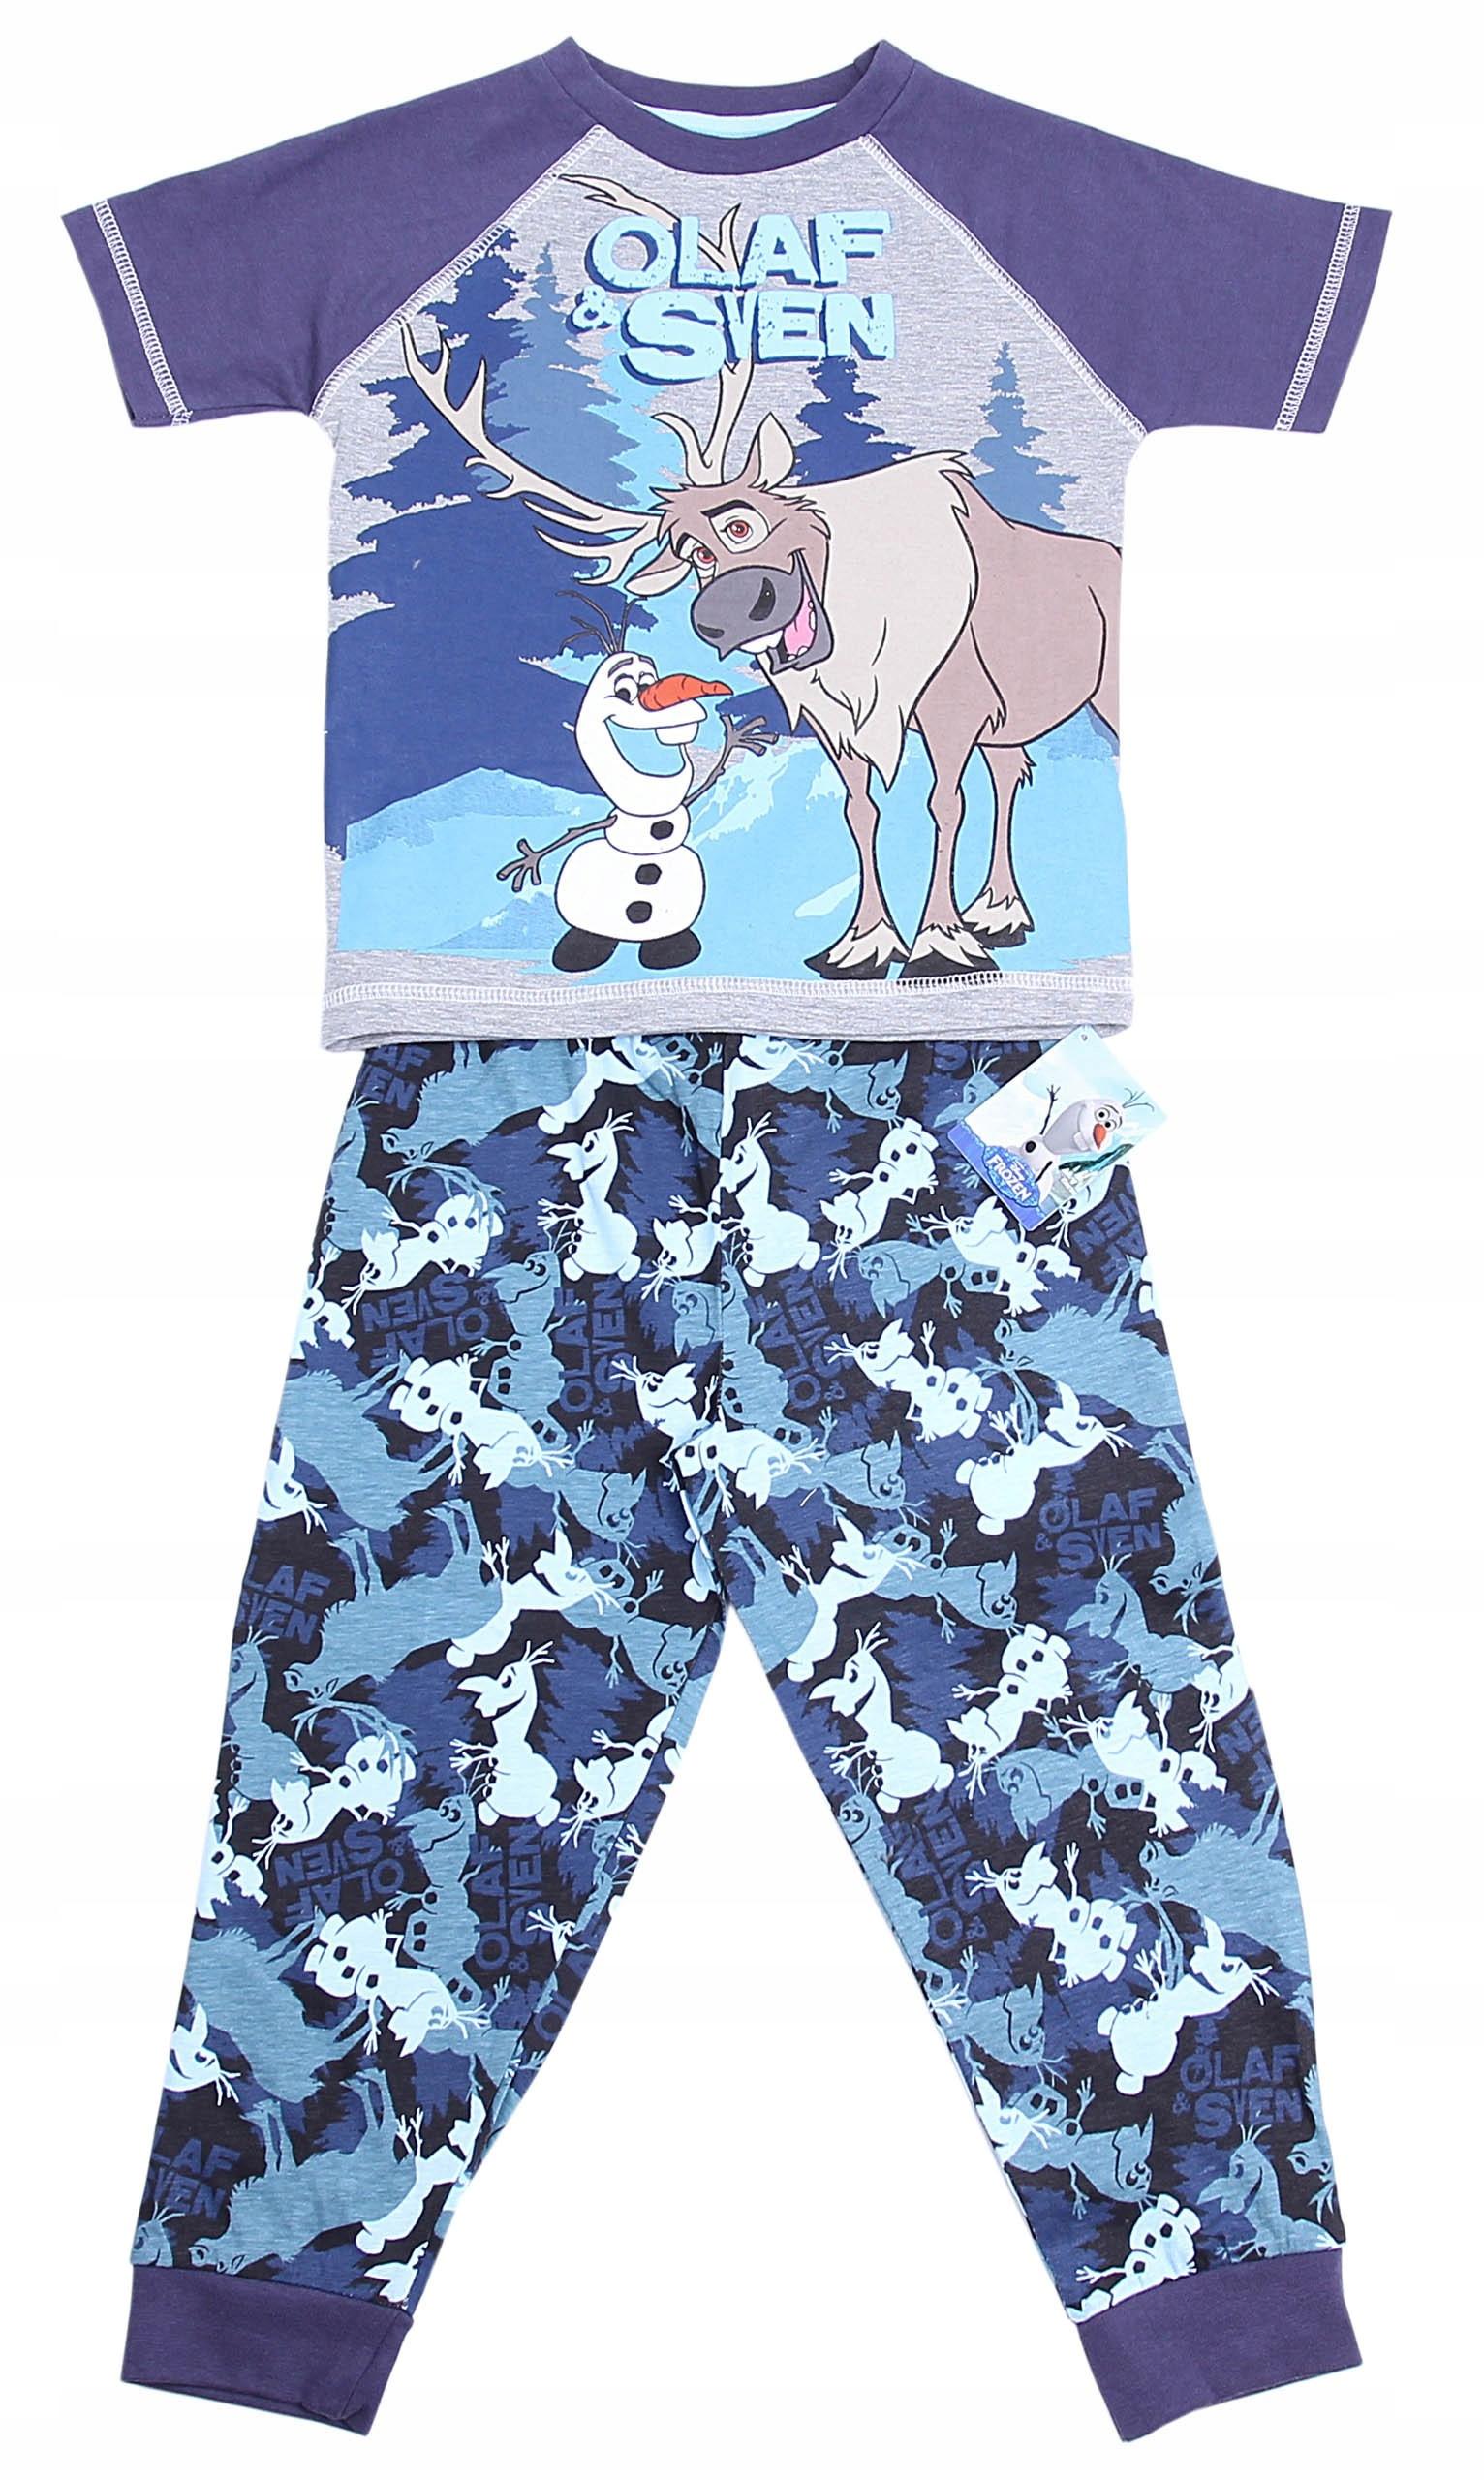 Dvojdielne pyžamo FROZEN PRIMARK 7-8 rokov 128 cm